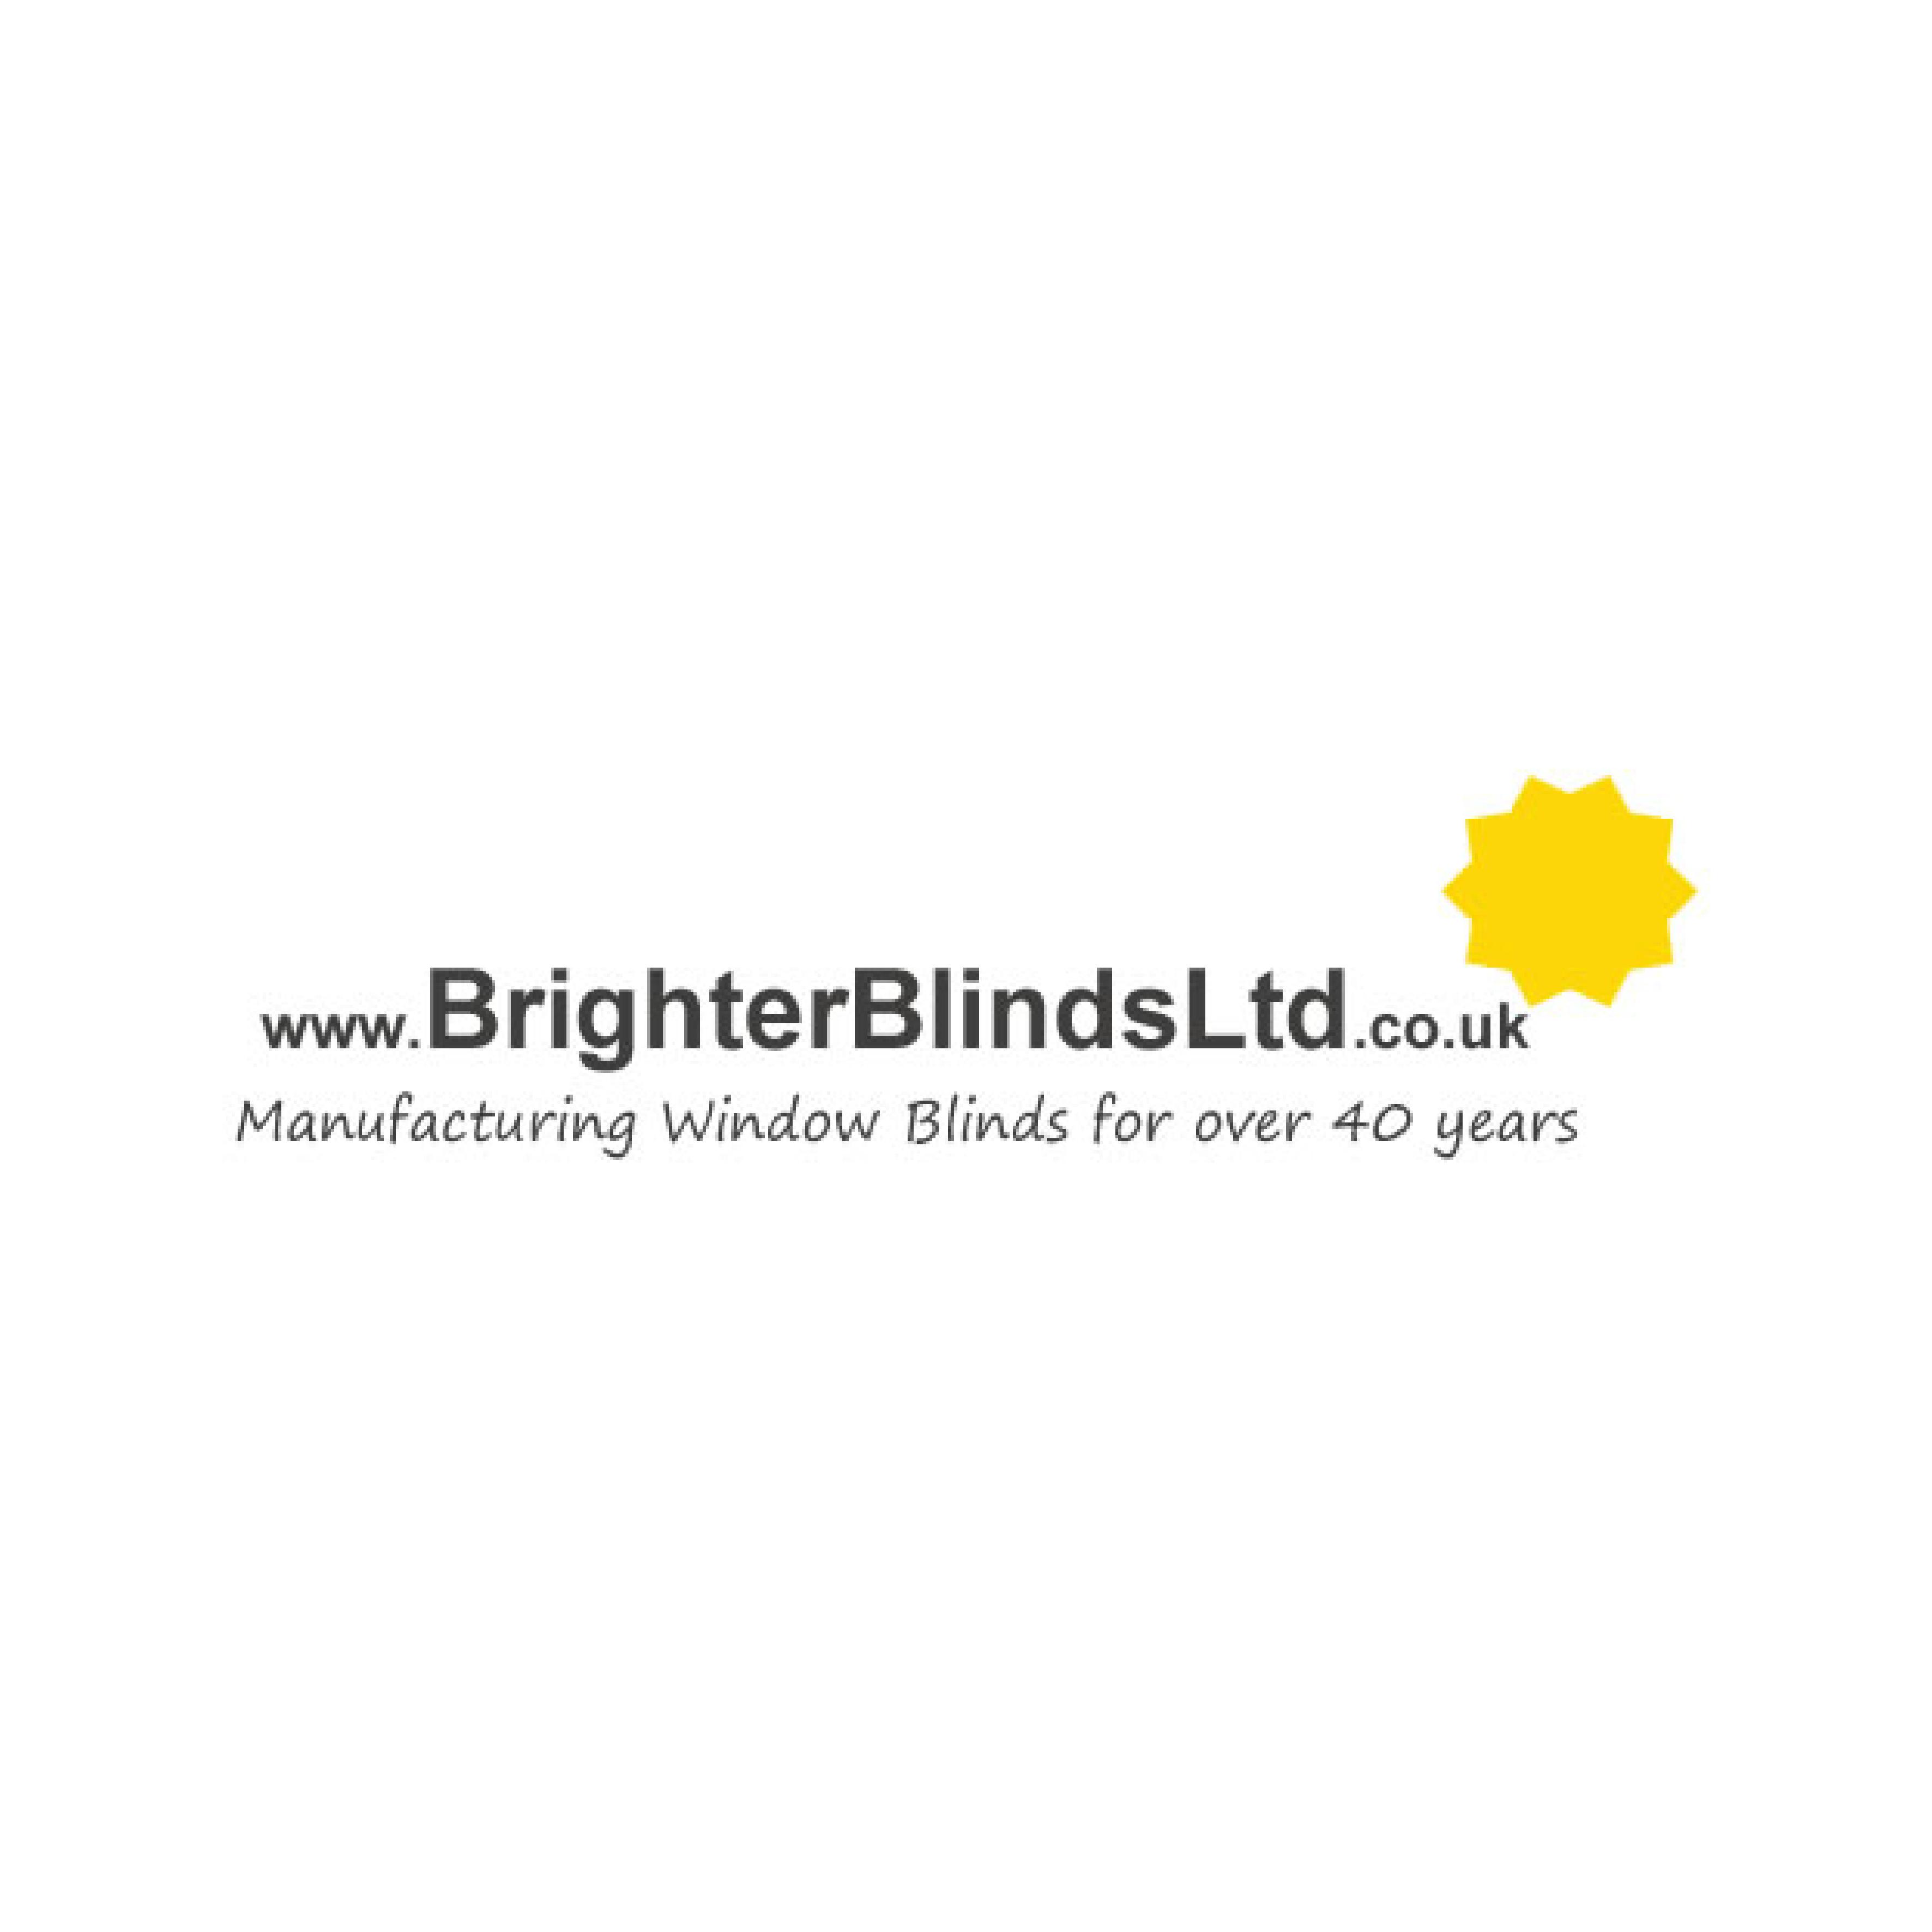 Brighter Blinds